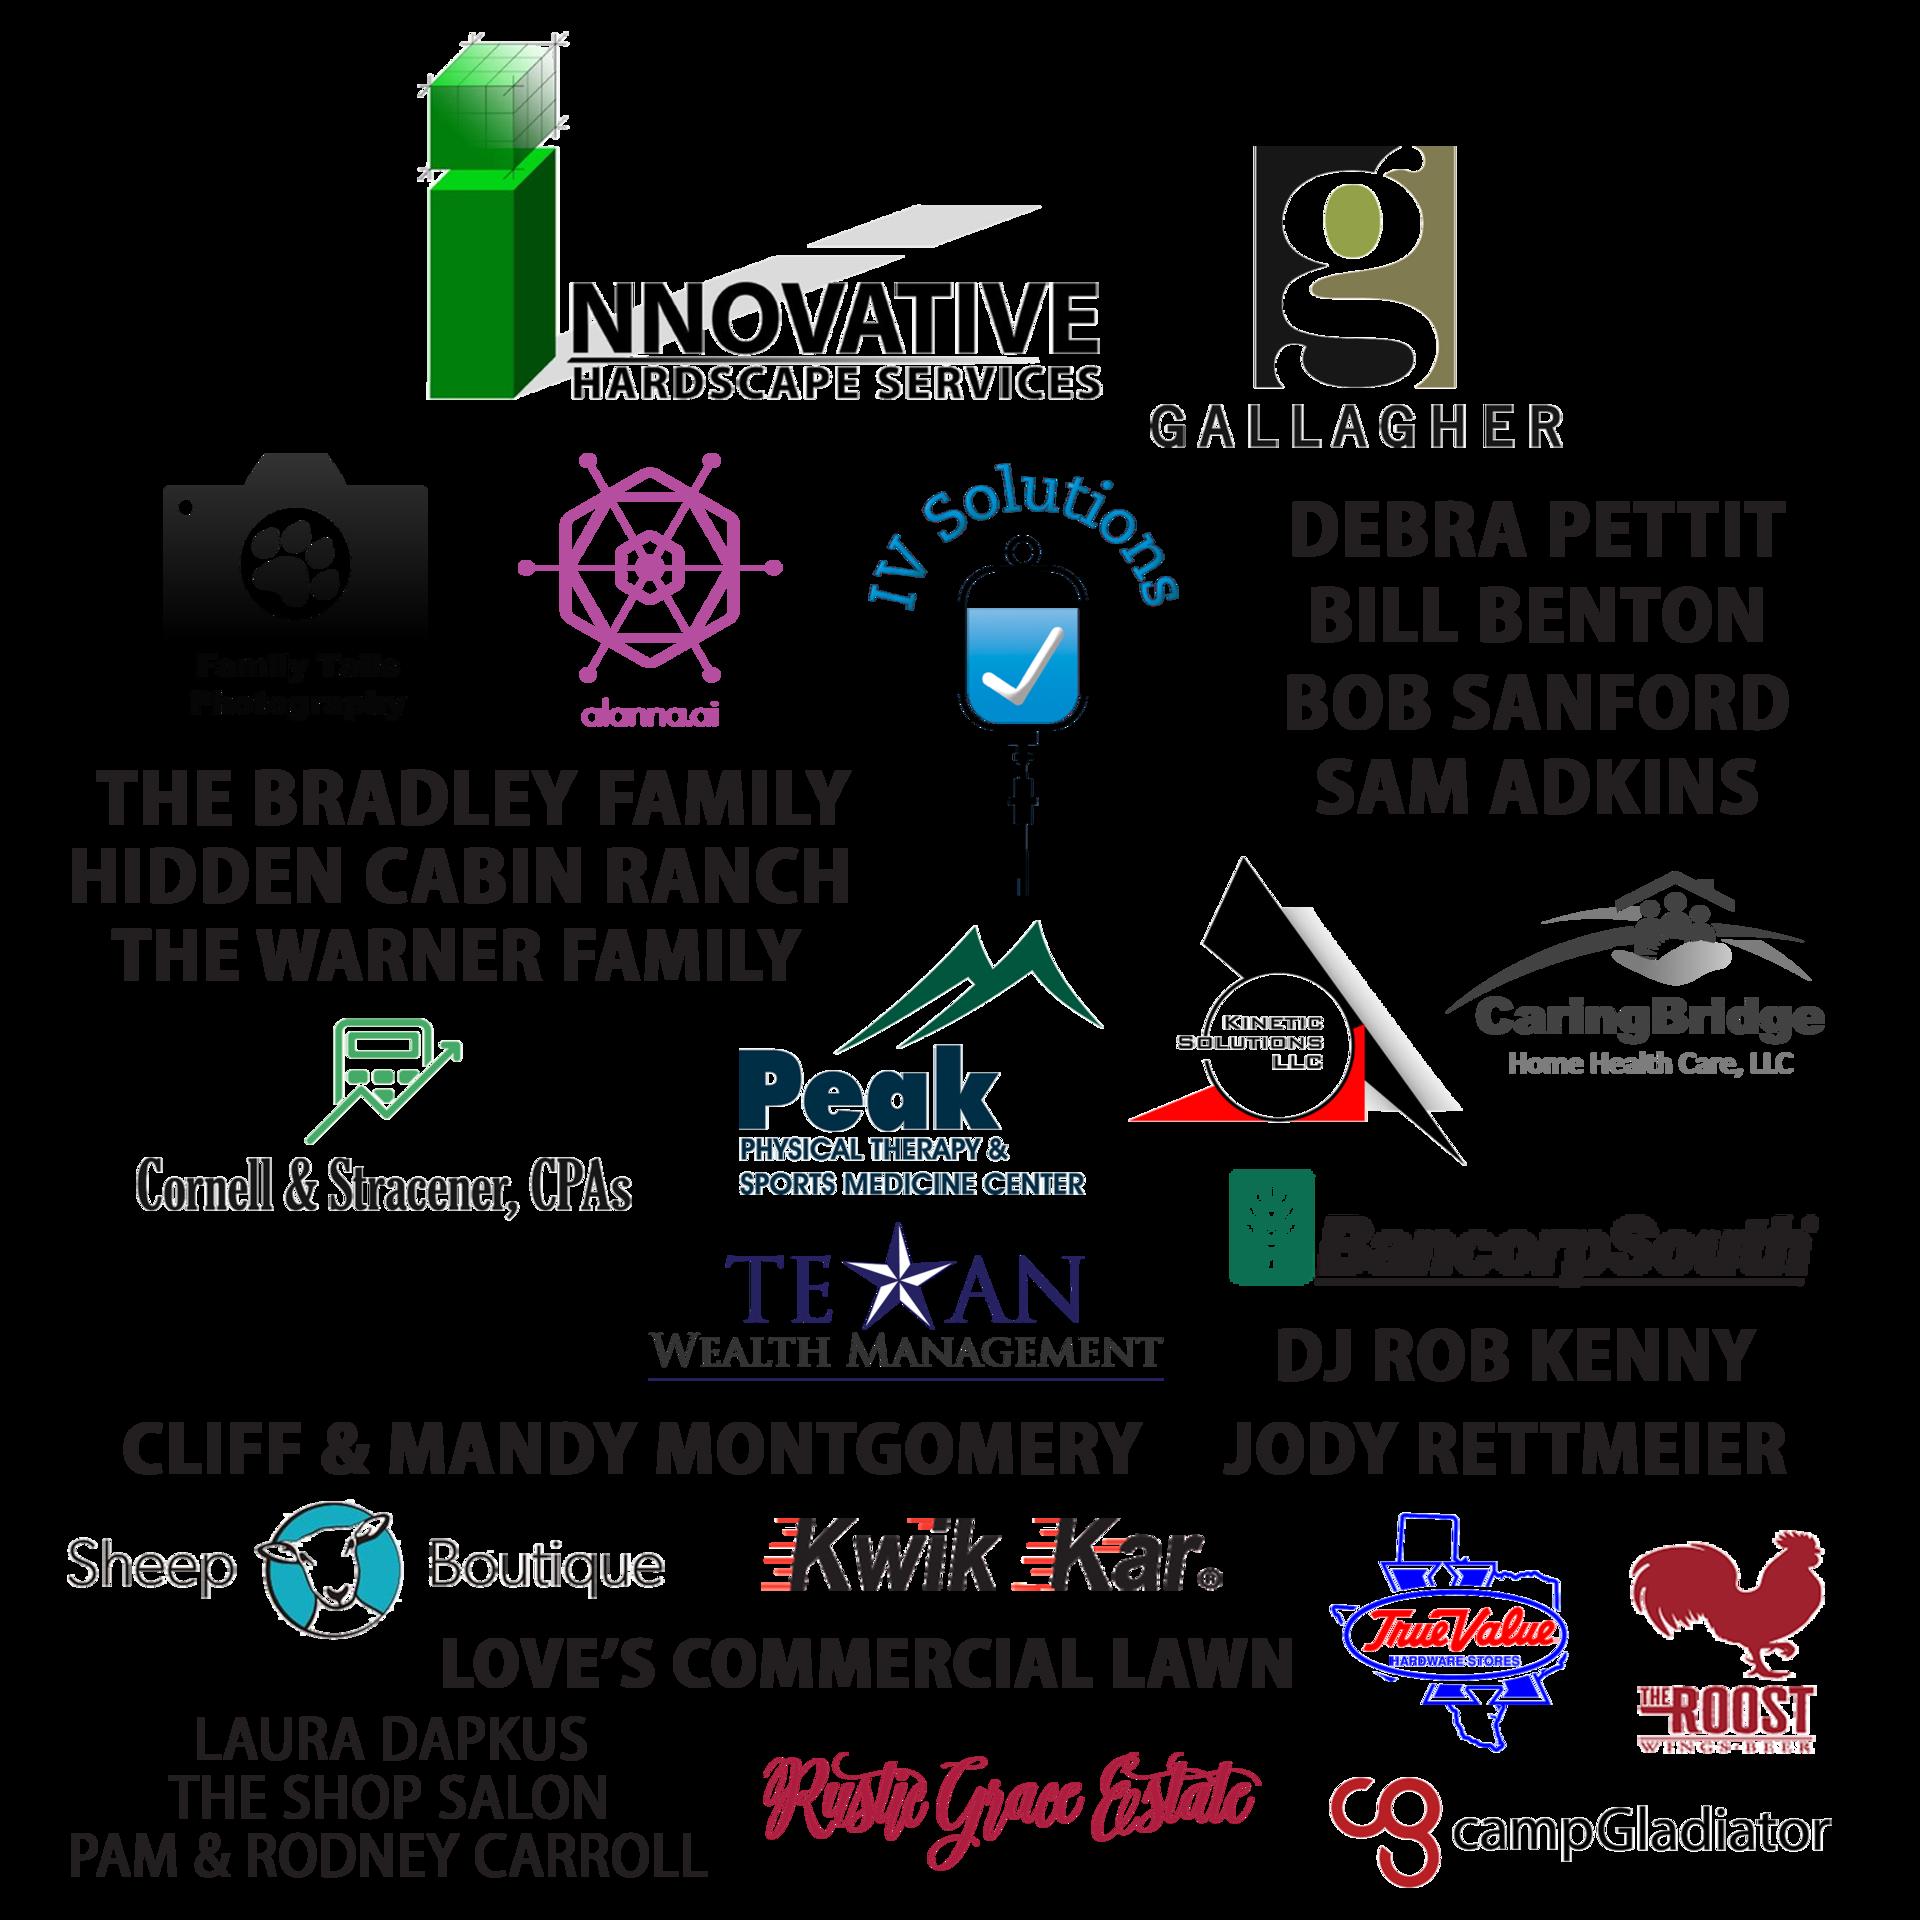 5k sponsors